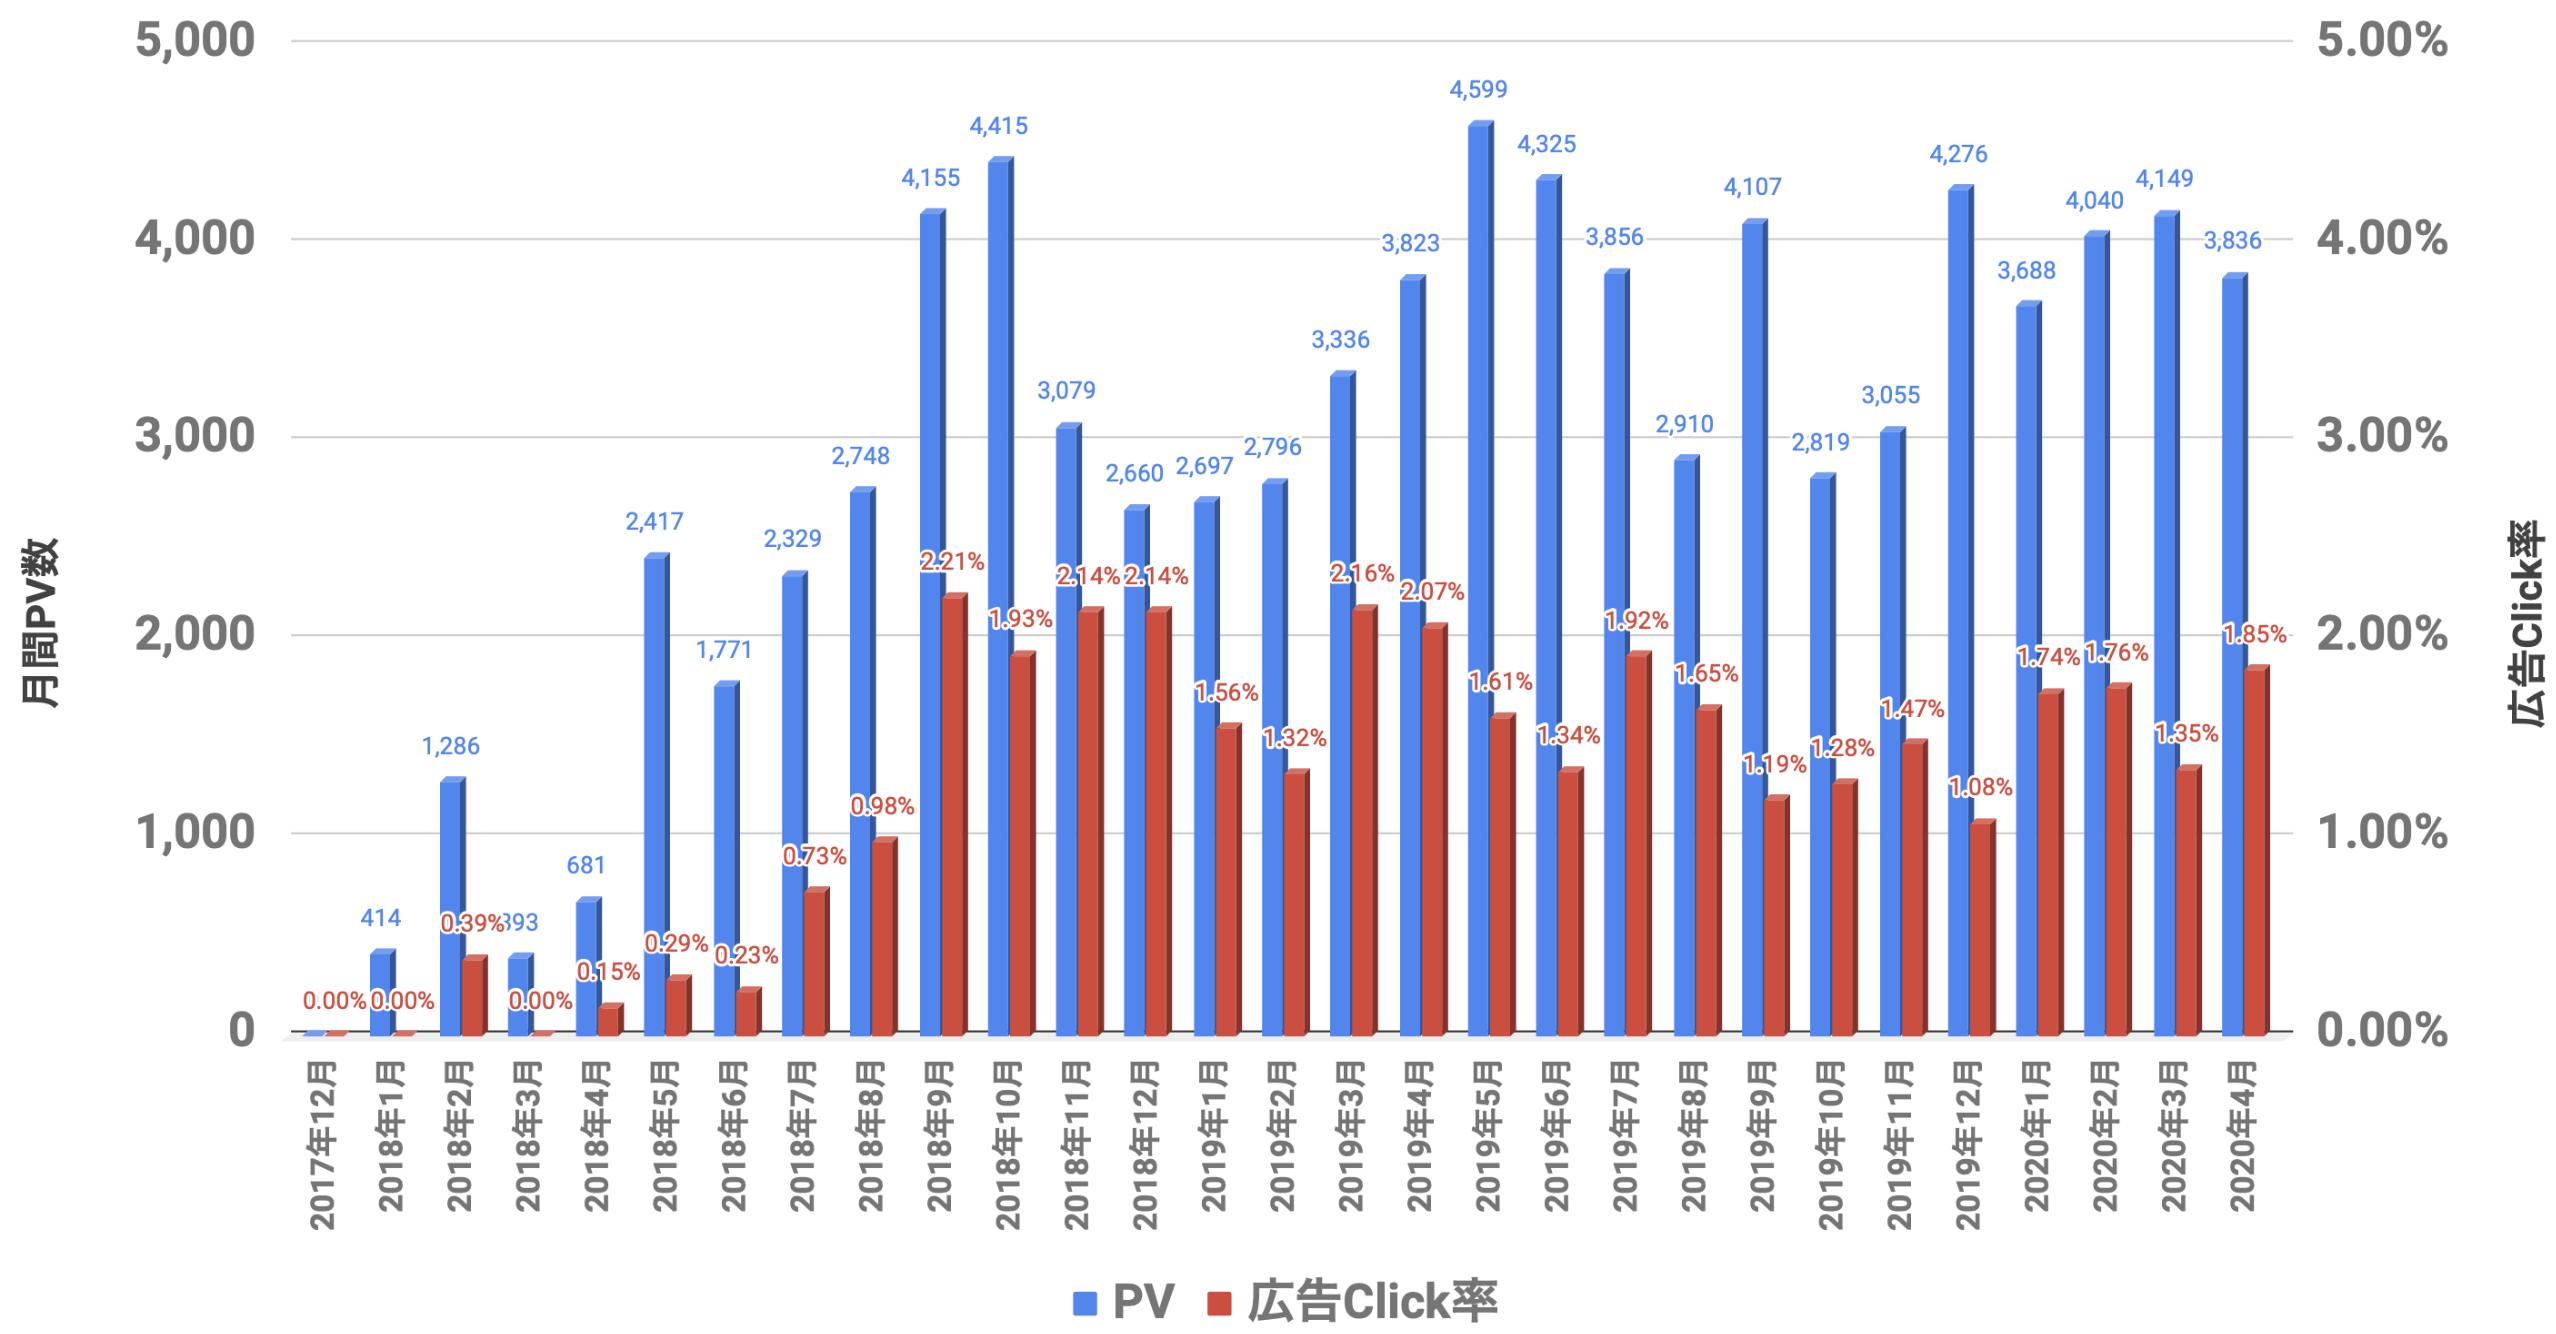 PVと広告Click率 2020年04月